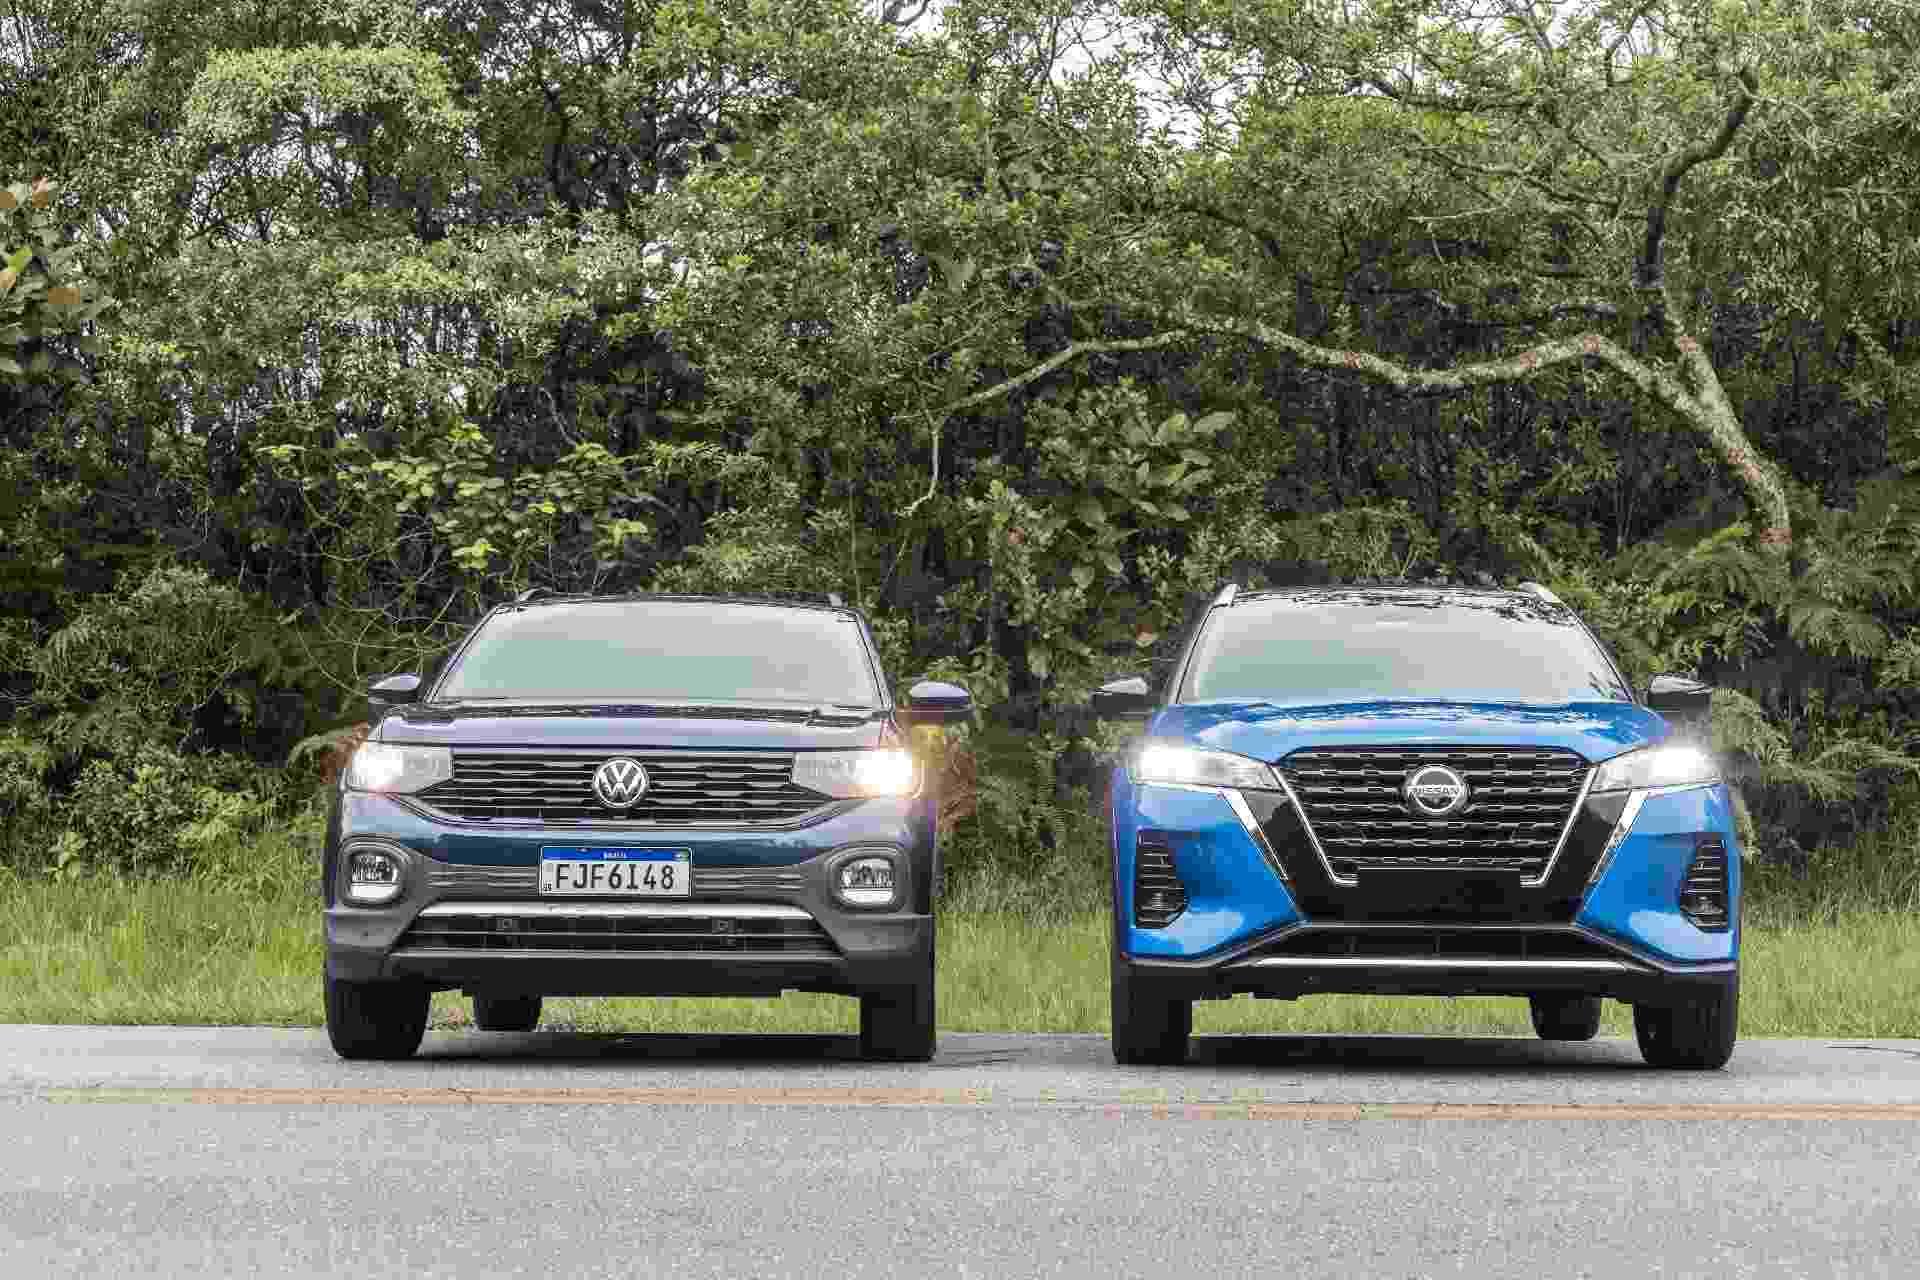 Volkswagen T-Cross x Nissan Kicks - Simon Plestenjak/UOL